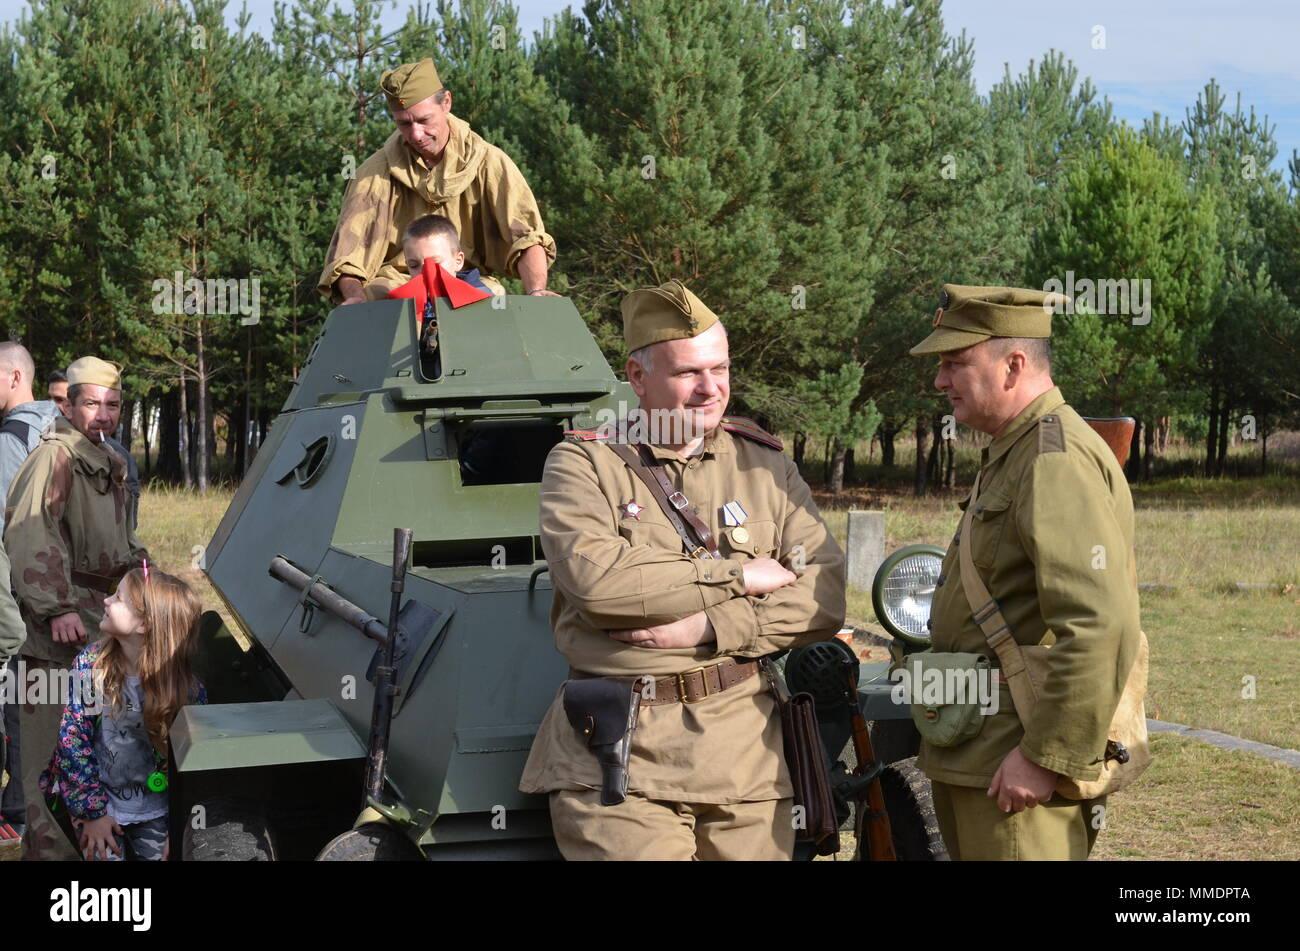 ZAGAN, Poland — Volunteers and historical reenactors from